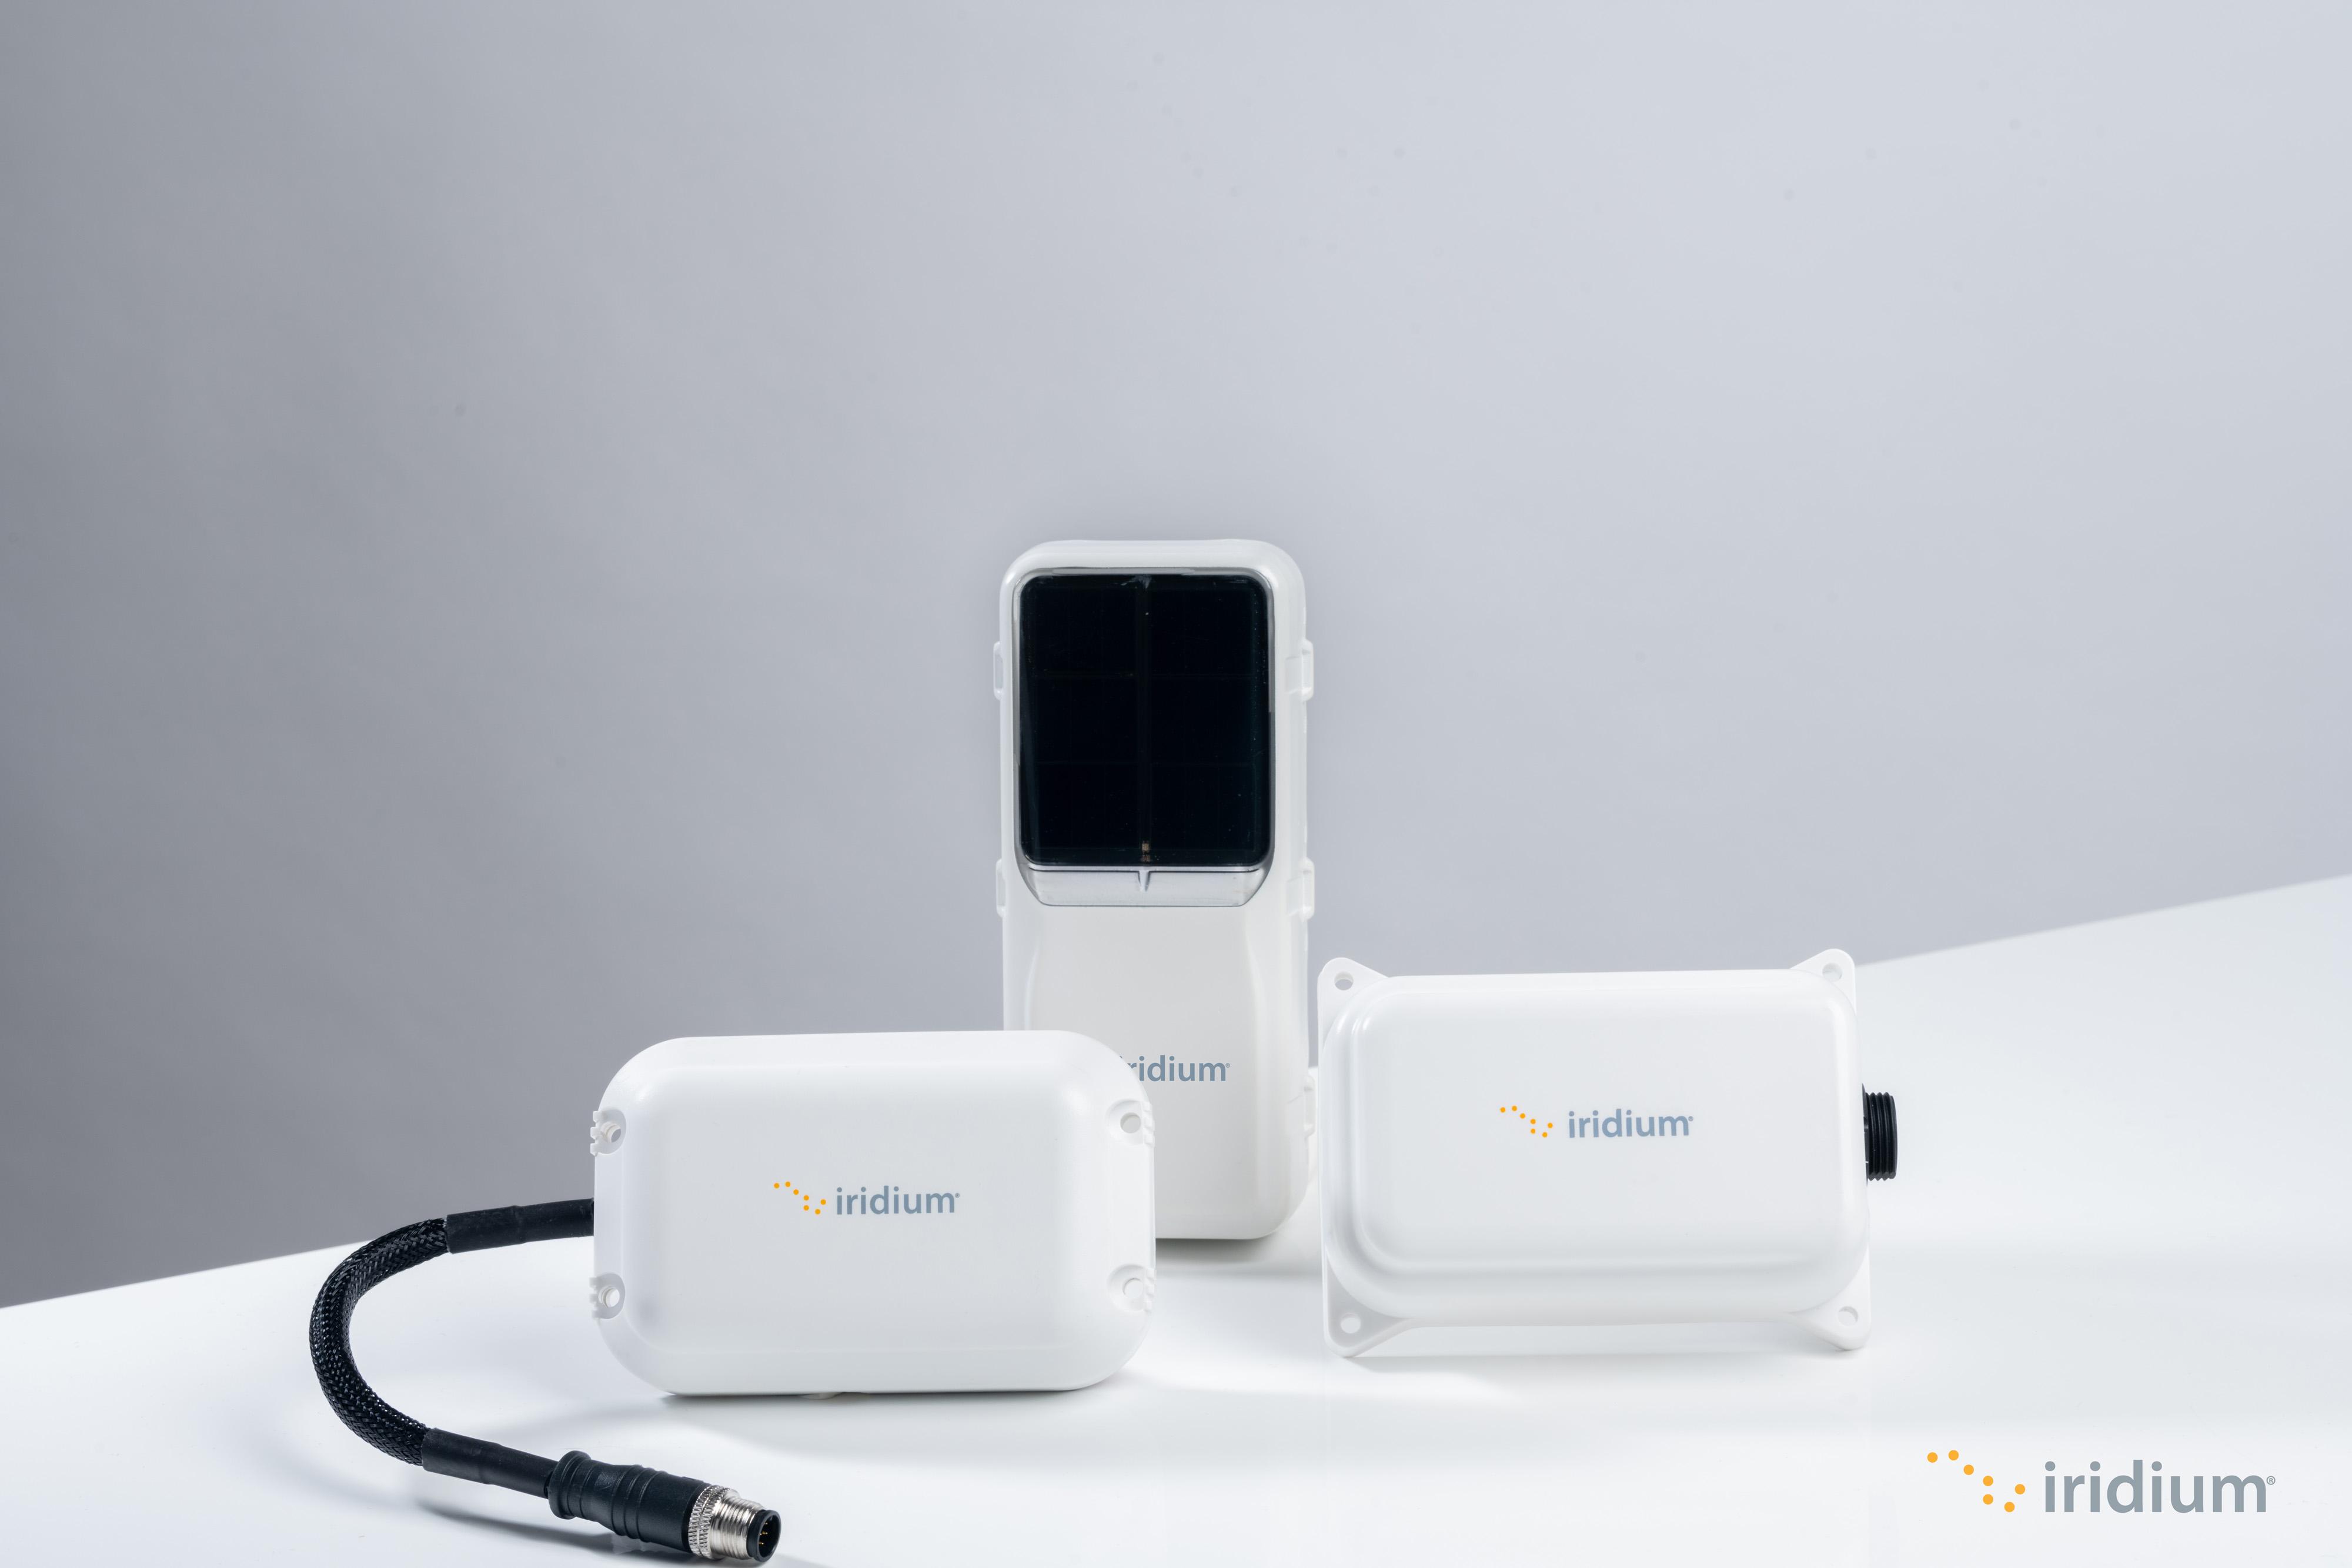 Iridium Edge family of products